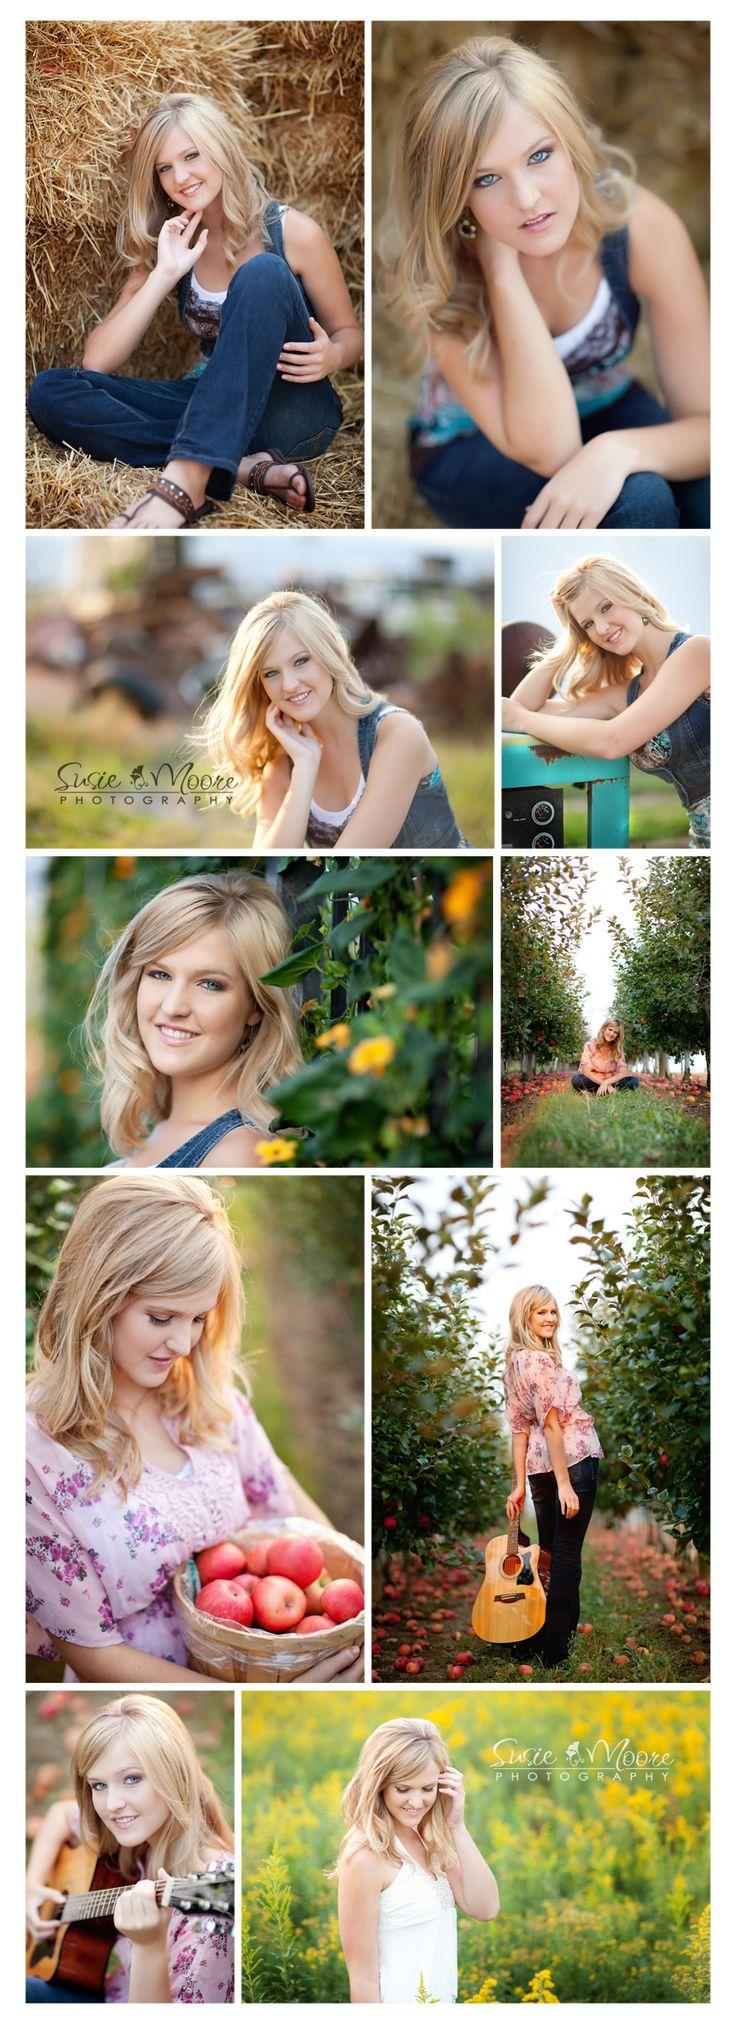 susie moore photography - senior girl